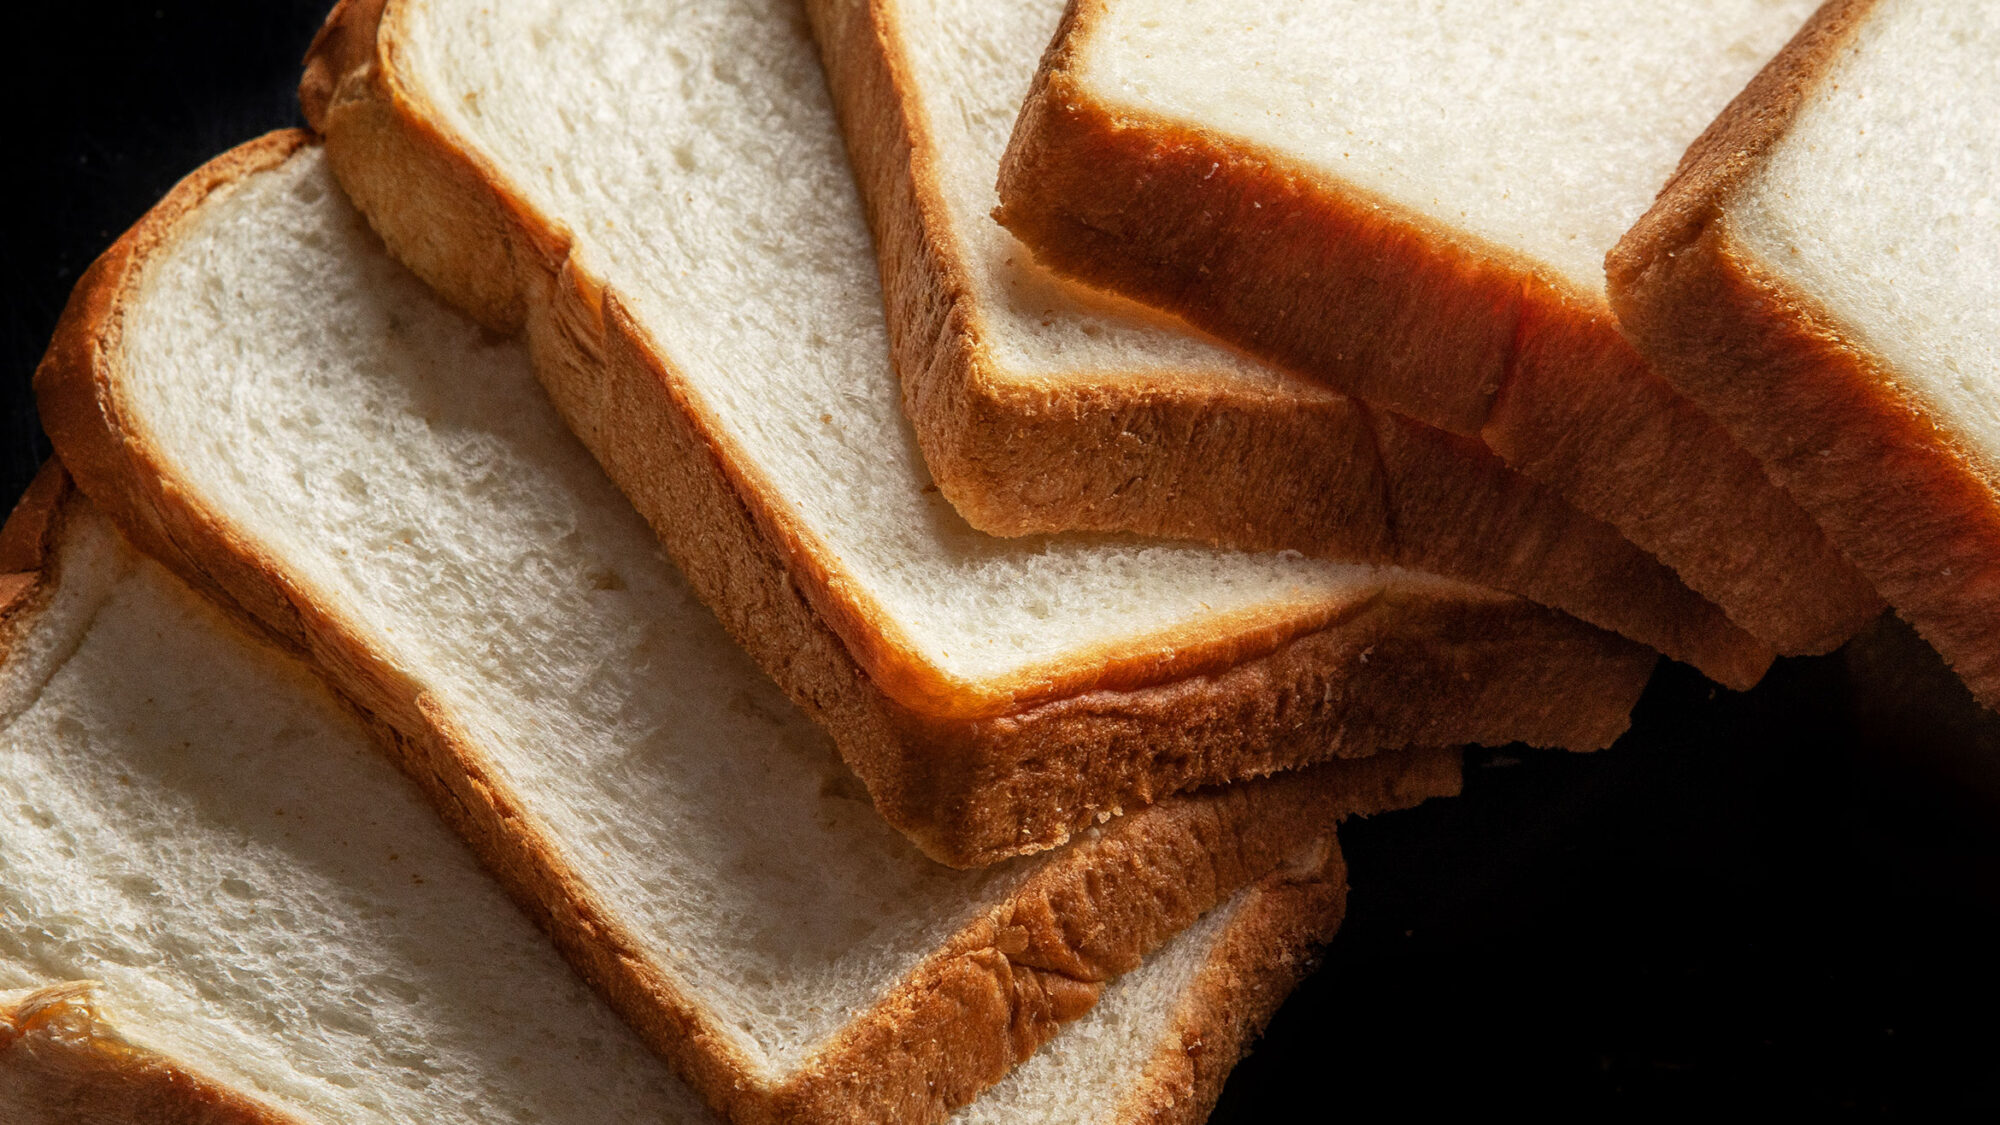 Article-tangzhong-Milk-Bread-Baking-technique